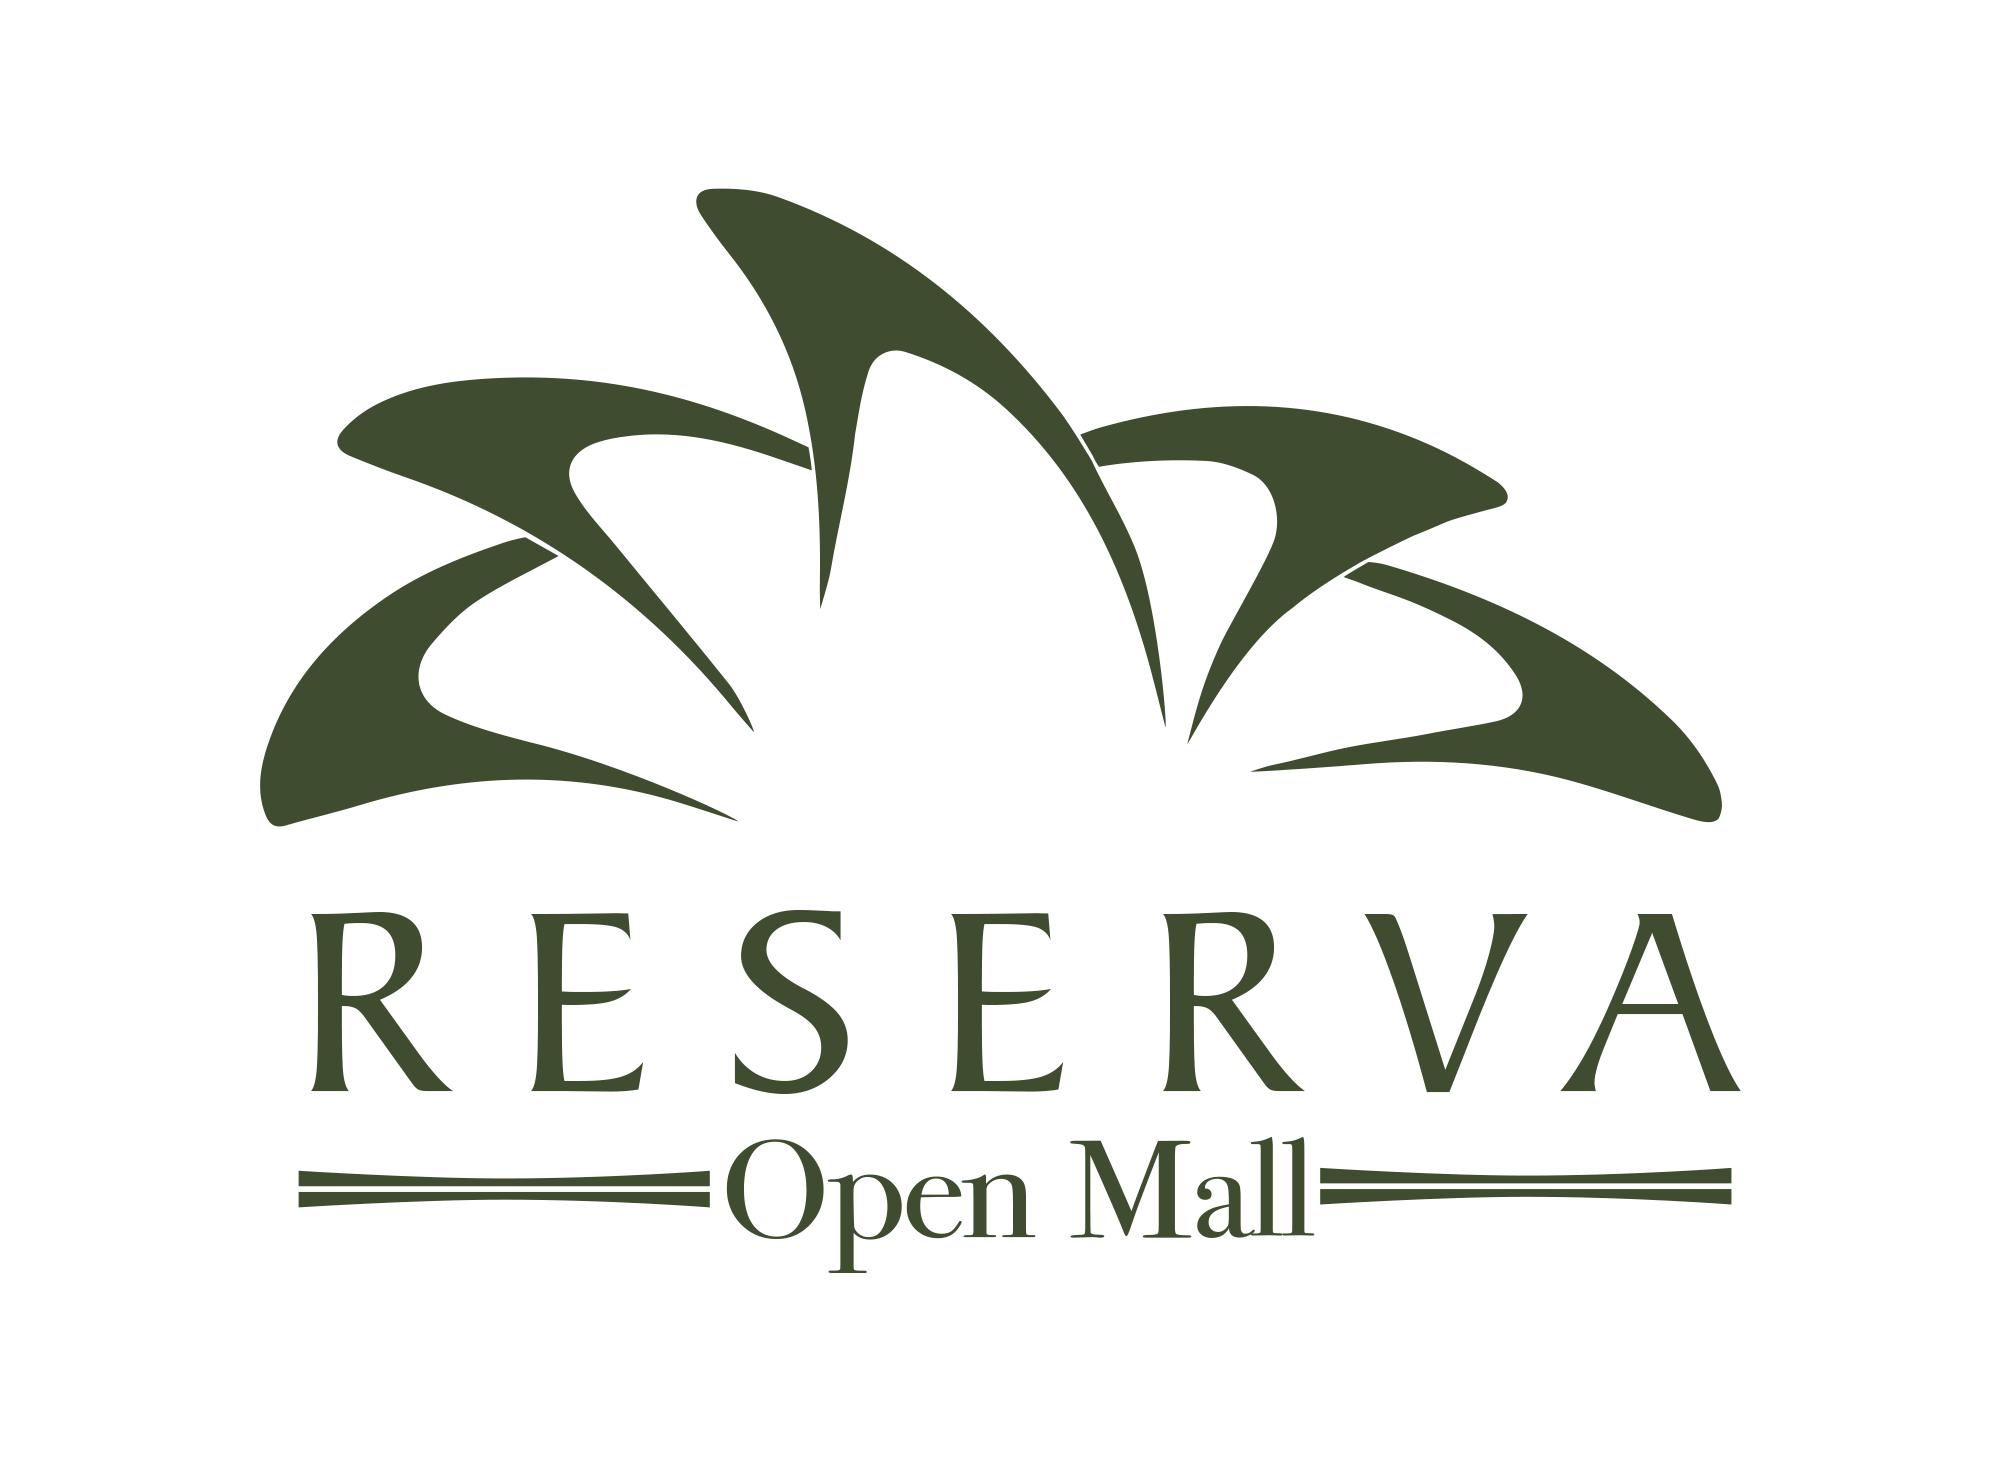 reserva-open-mall-clientes-agencia-diretriz-digital-marketing-fortaleza